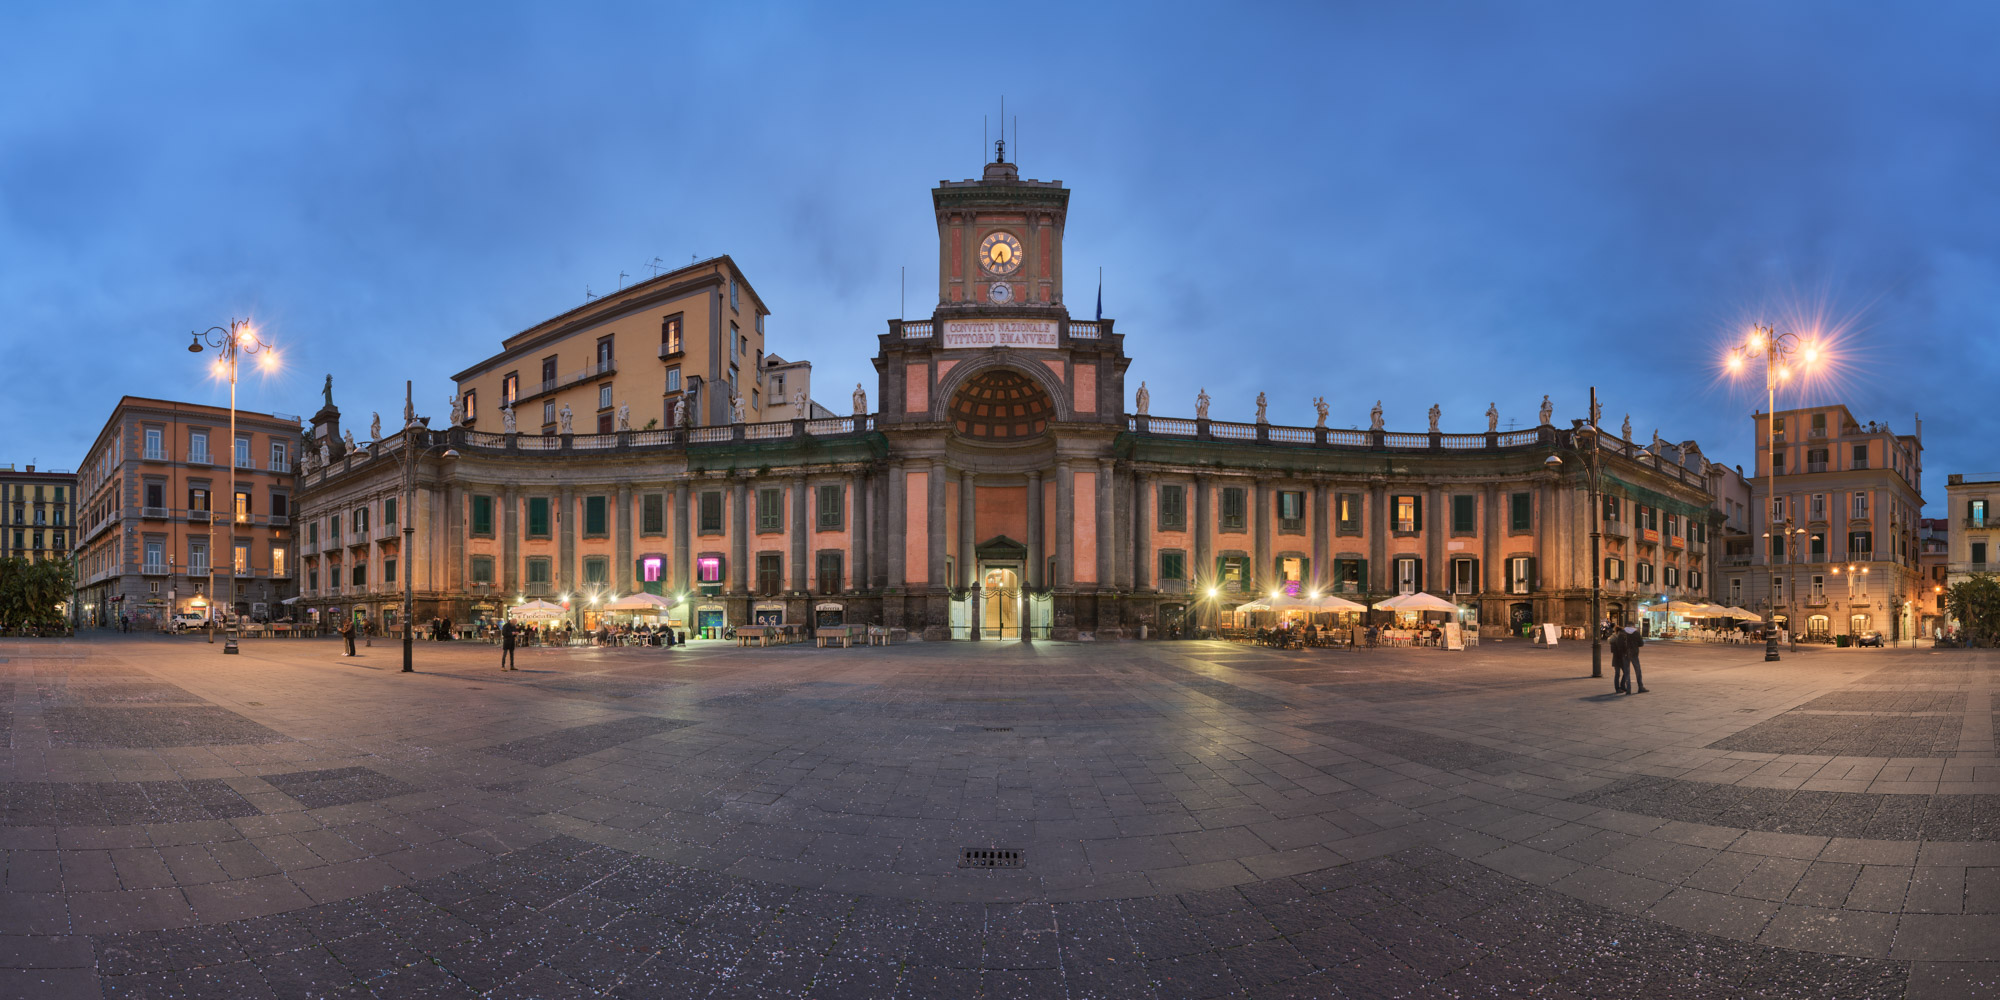 Convitto Nazionale Vittorio Emanuele II, Naples, Italy